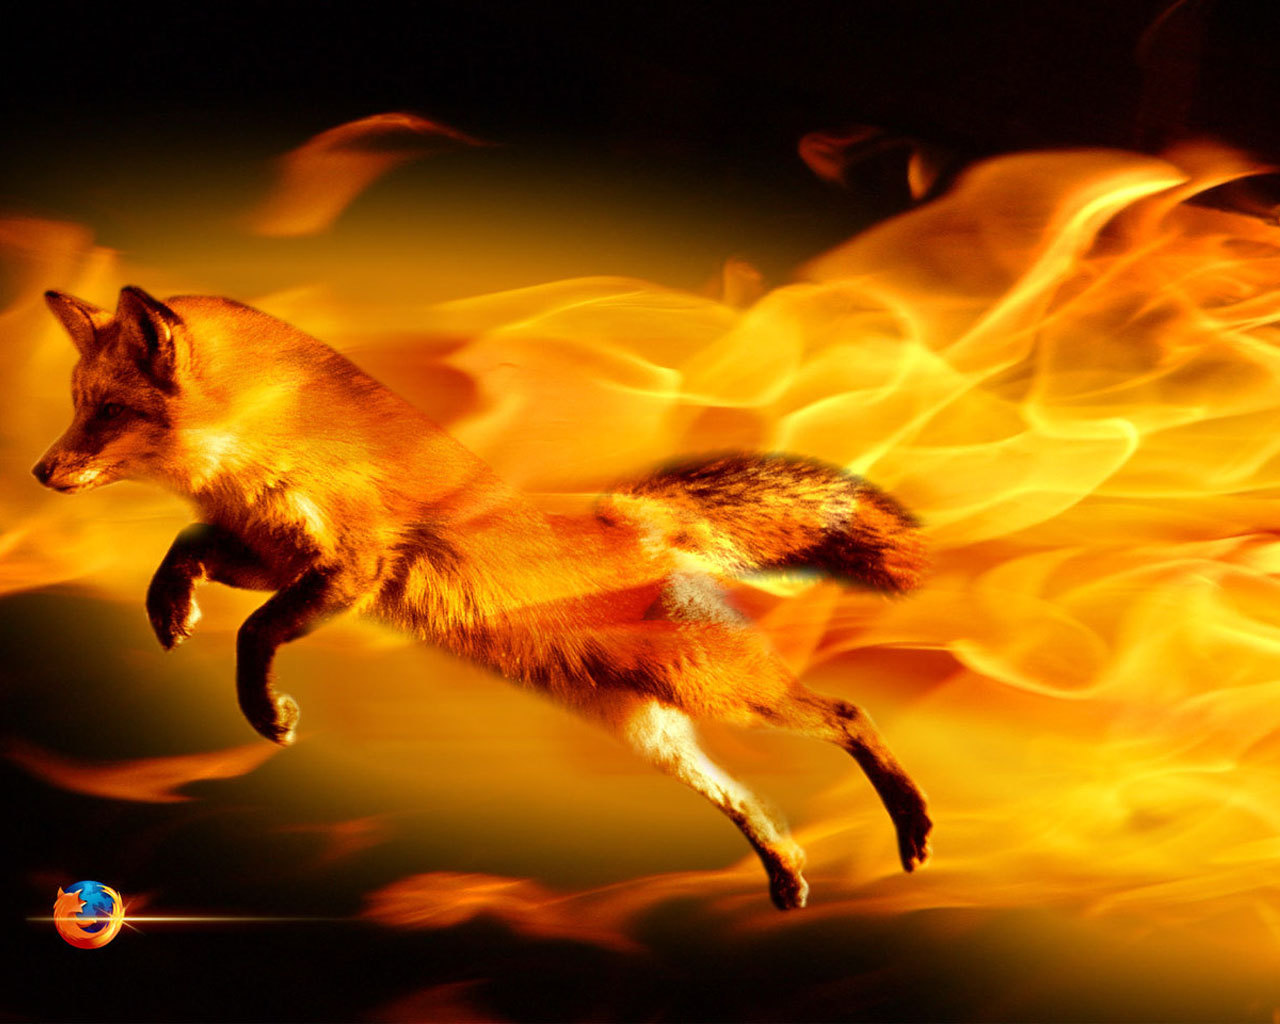 hd wallpapers desktop fire - photo #29